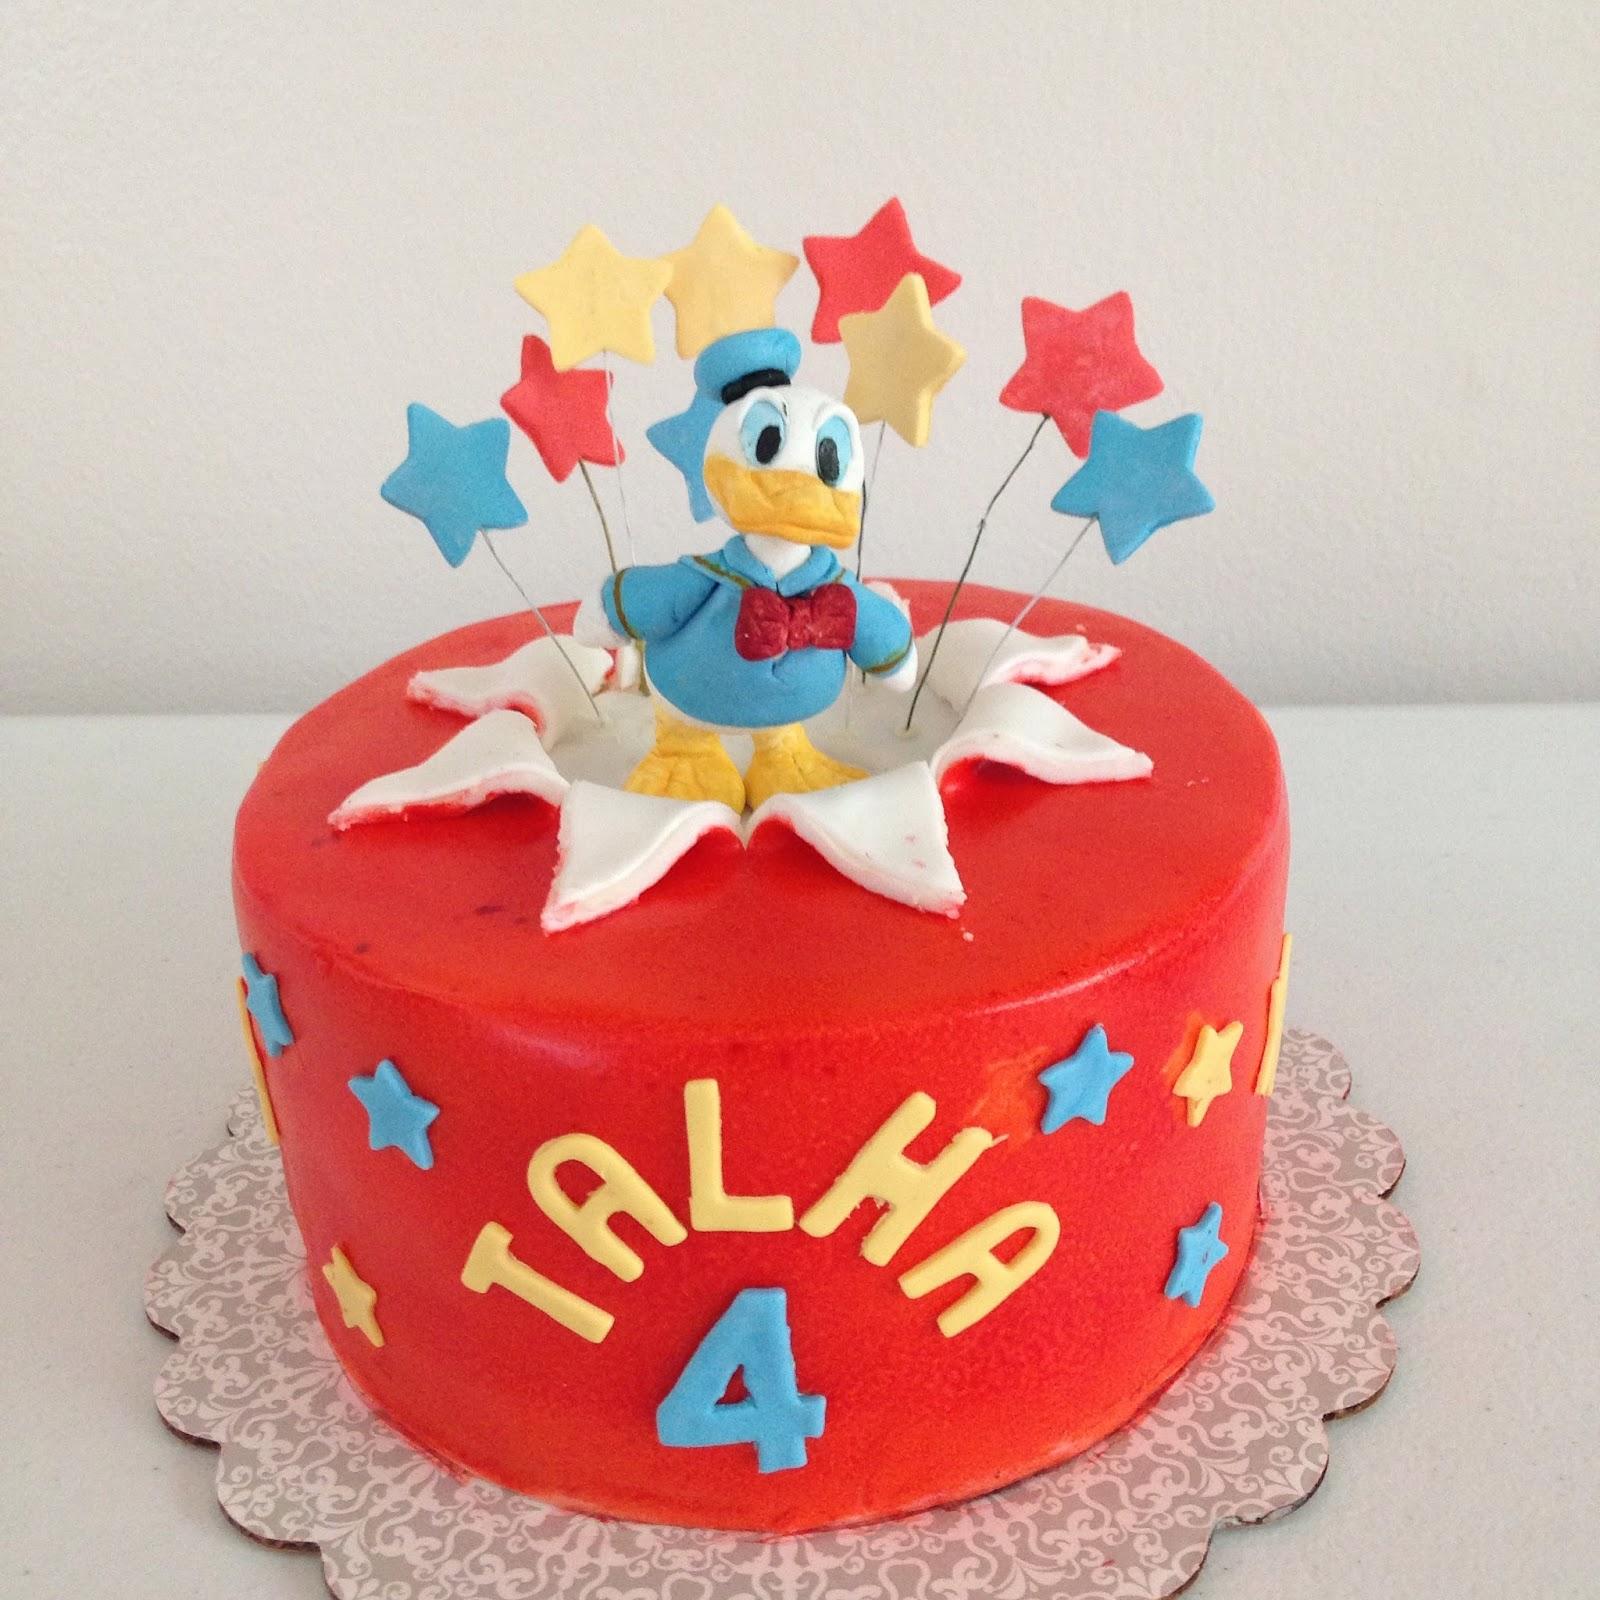 Boy Birthday Cake Kids Birthday Cake Fun Sugar Cookies